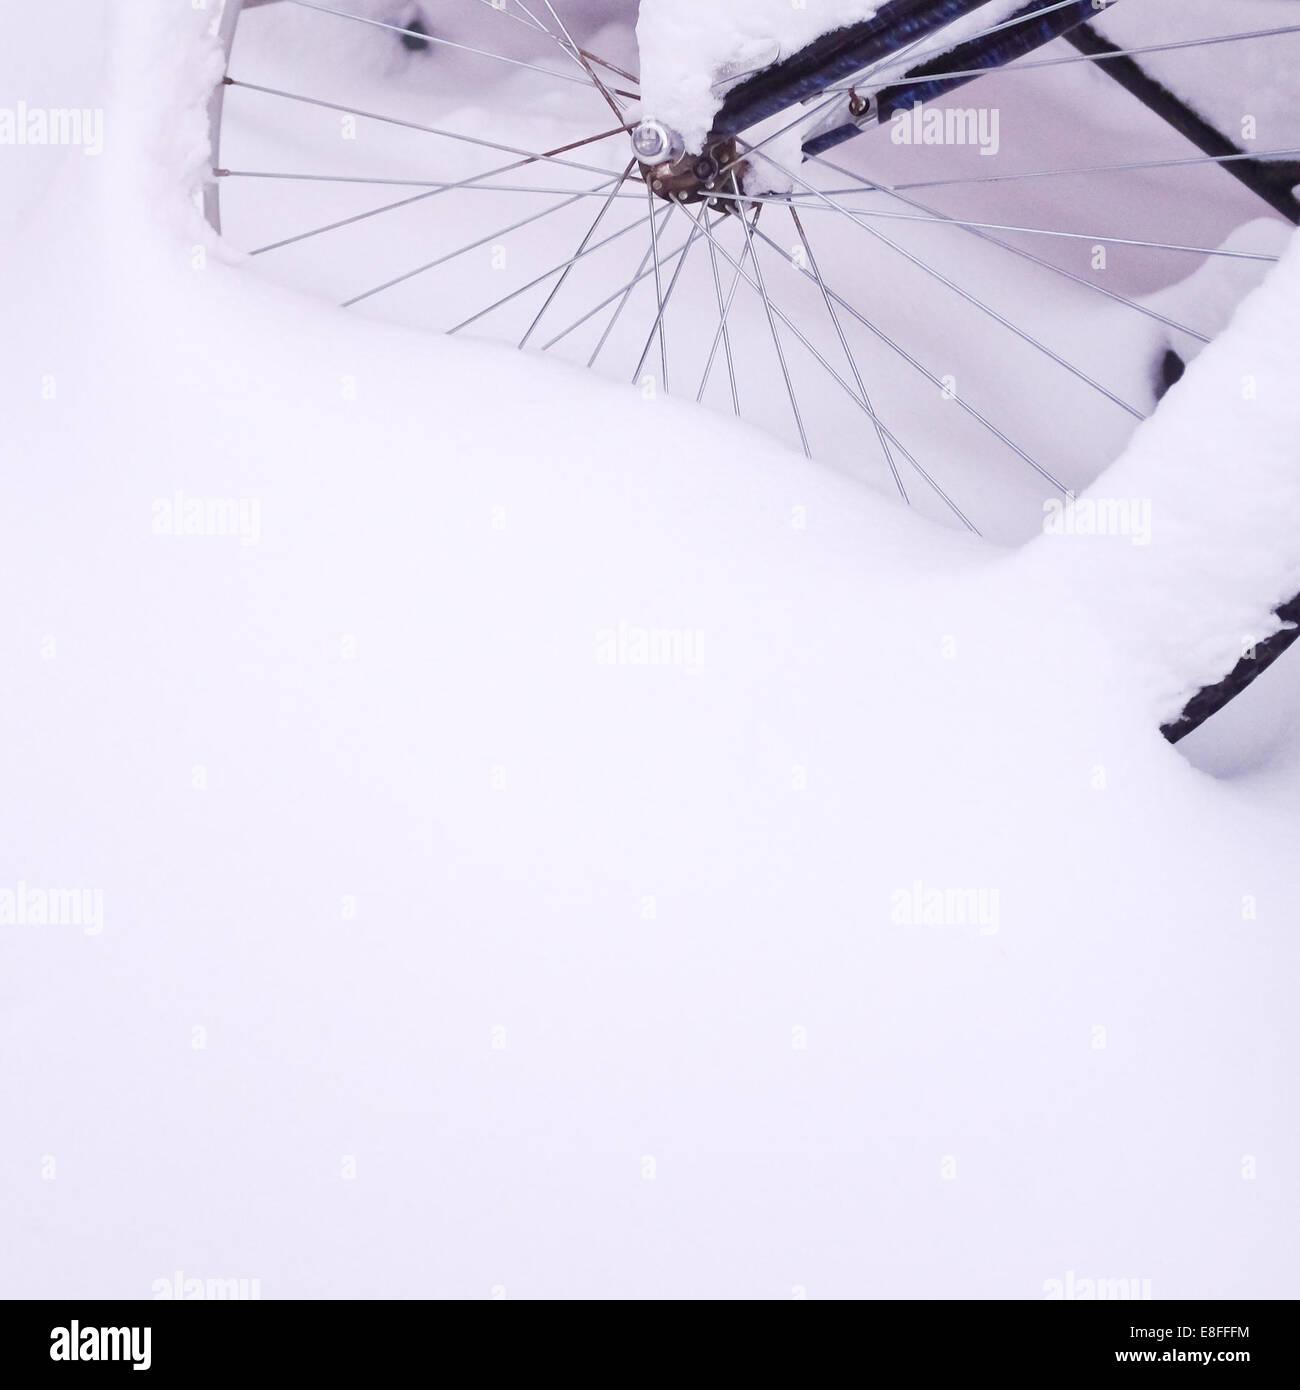 Bike wheel covered with fresh snow Stock Photo